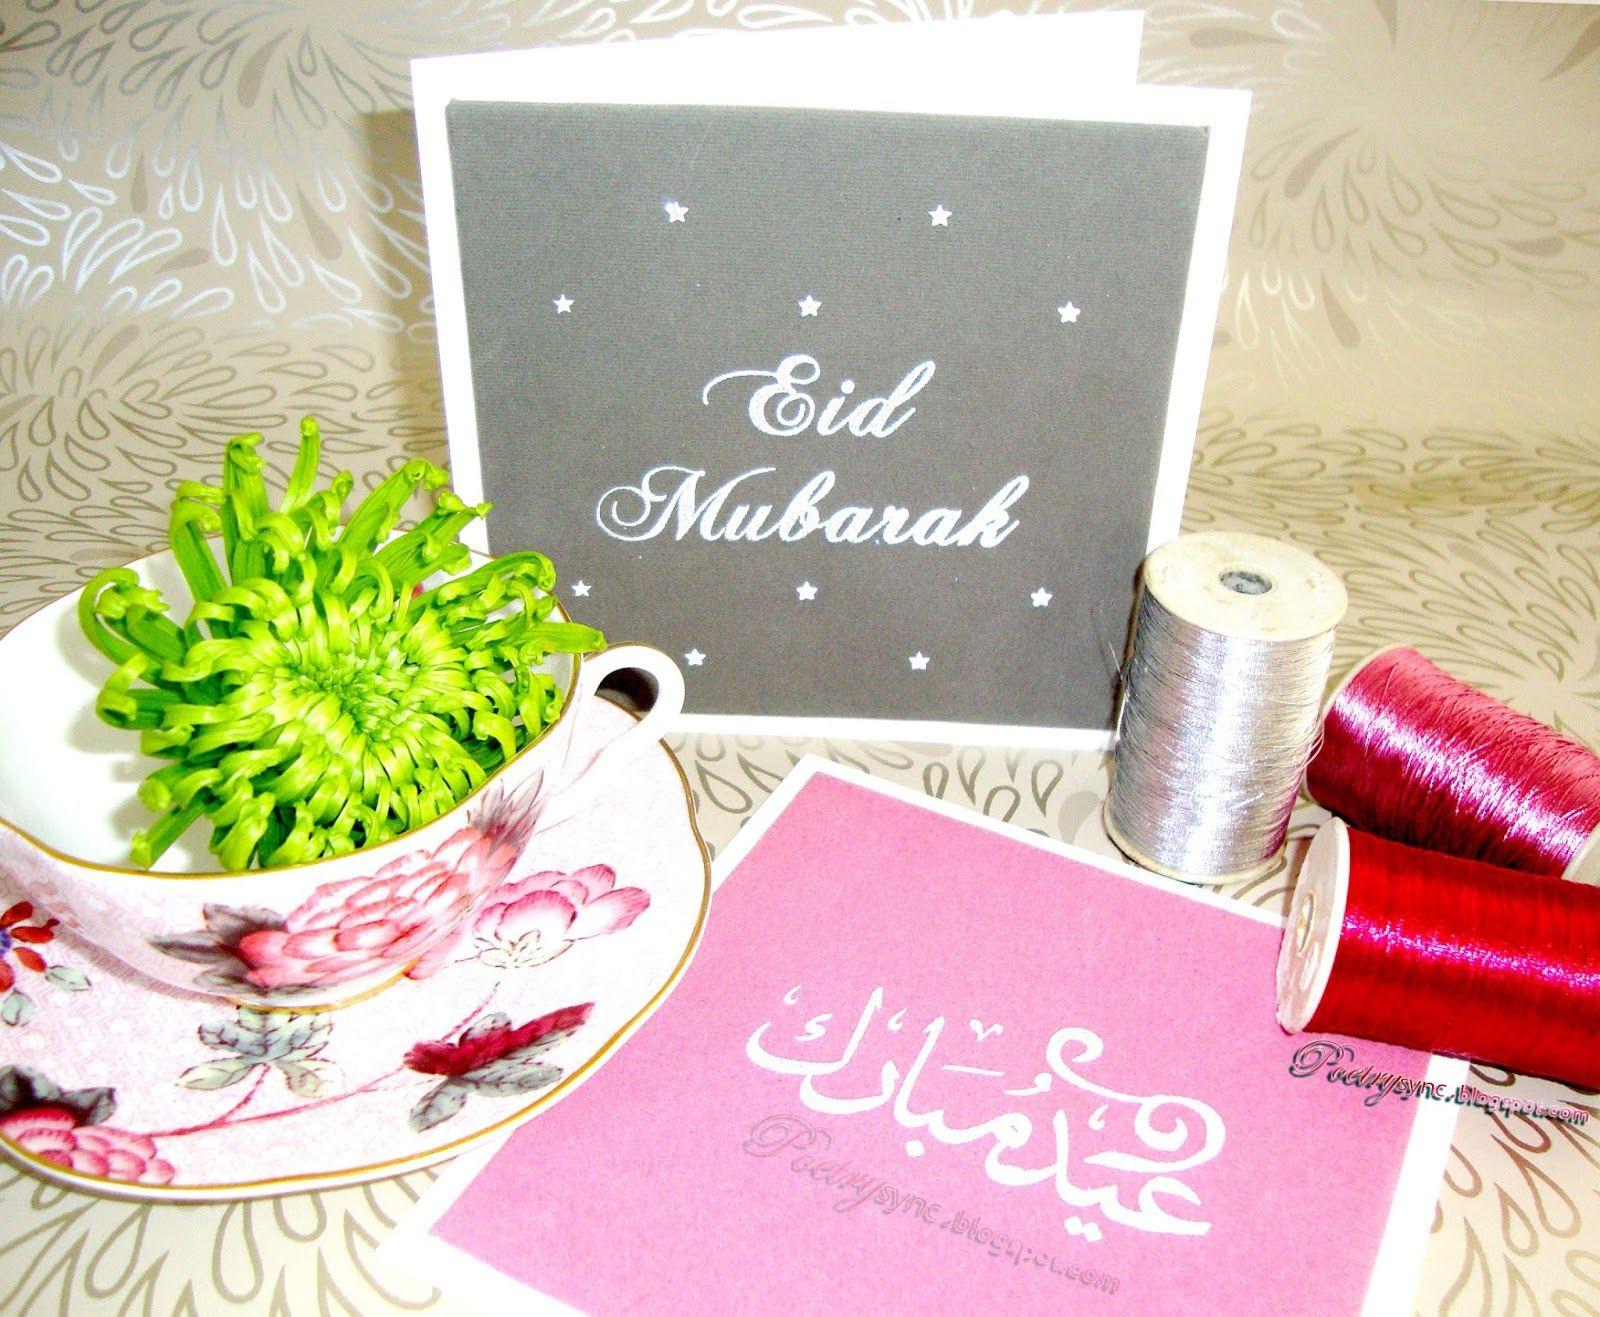 Eid Cards Making Ideas Part - 49: Eid, Eid 2013, Eid Mubarak 2013, When Is Eid, Eid Ul Adha